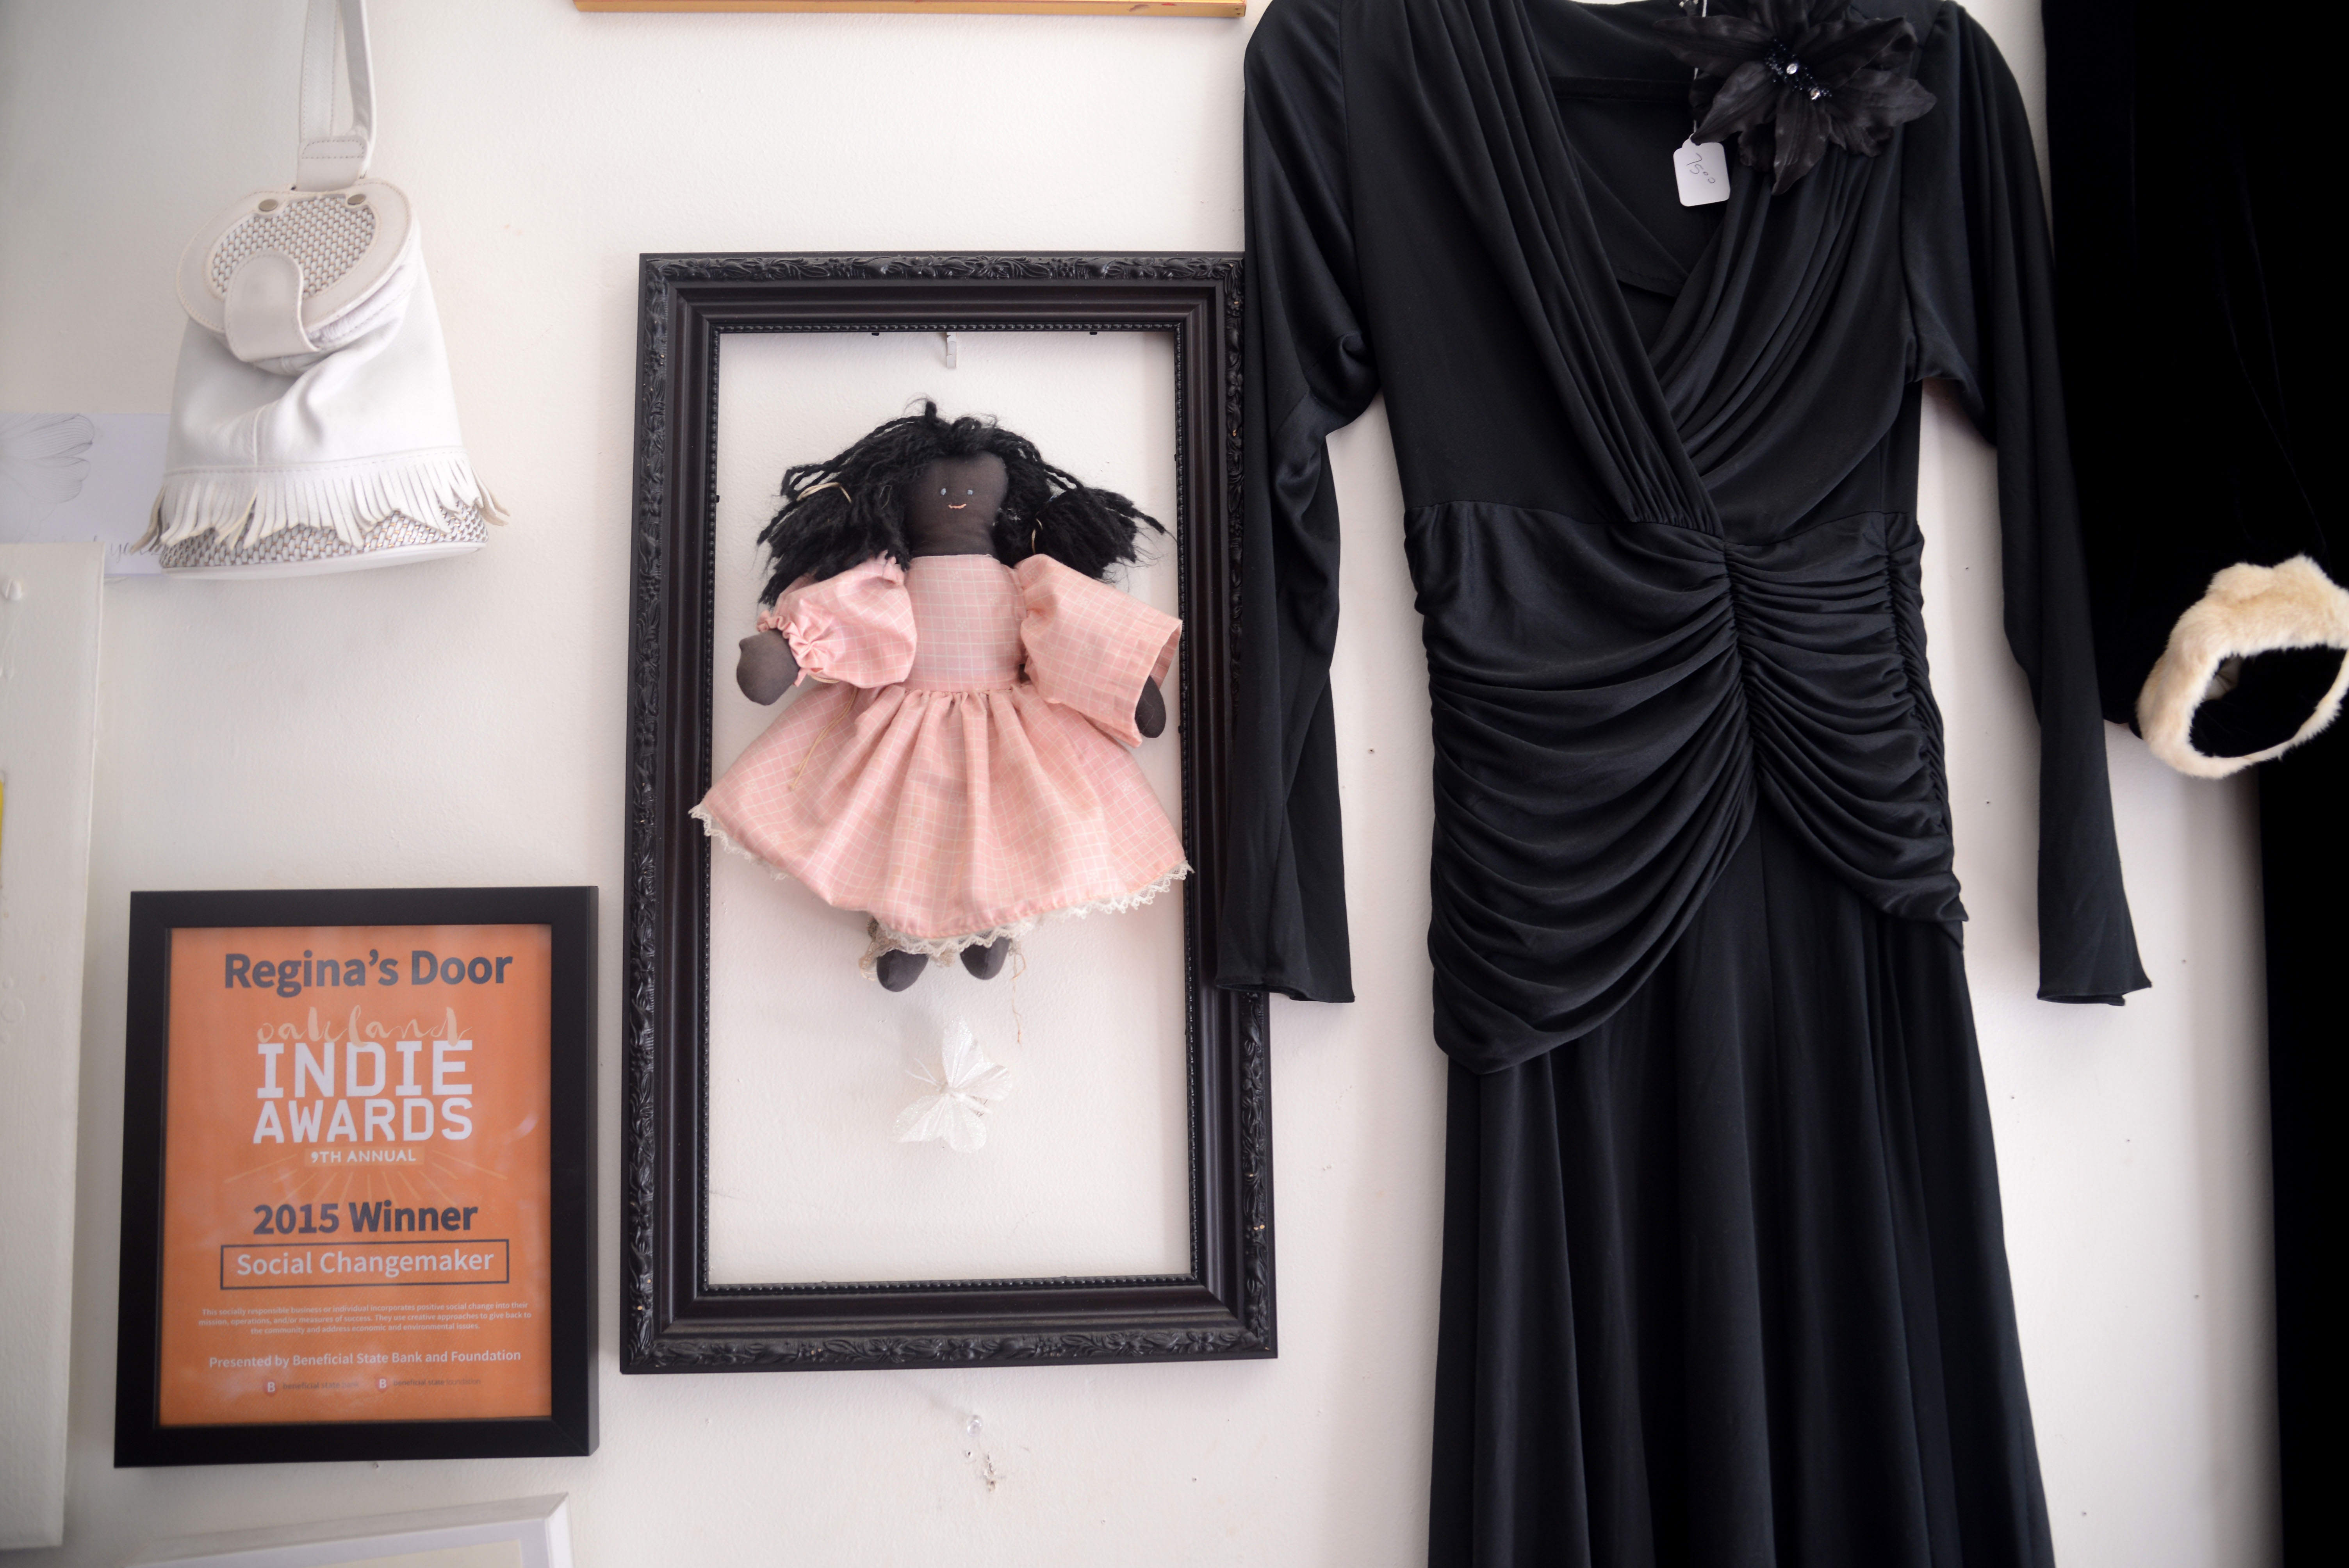 Artwork hangs next to the Social Changemaker Award from the city of Oakland at Regina's Door.